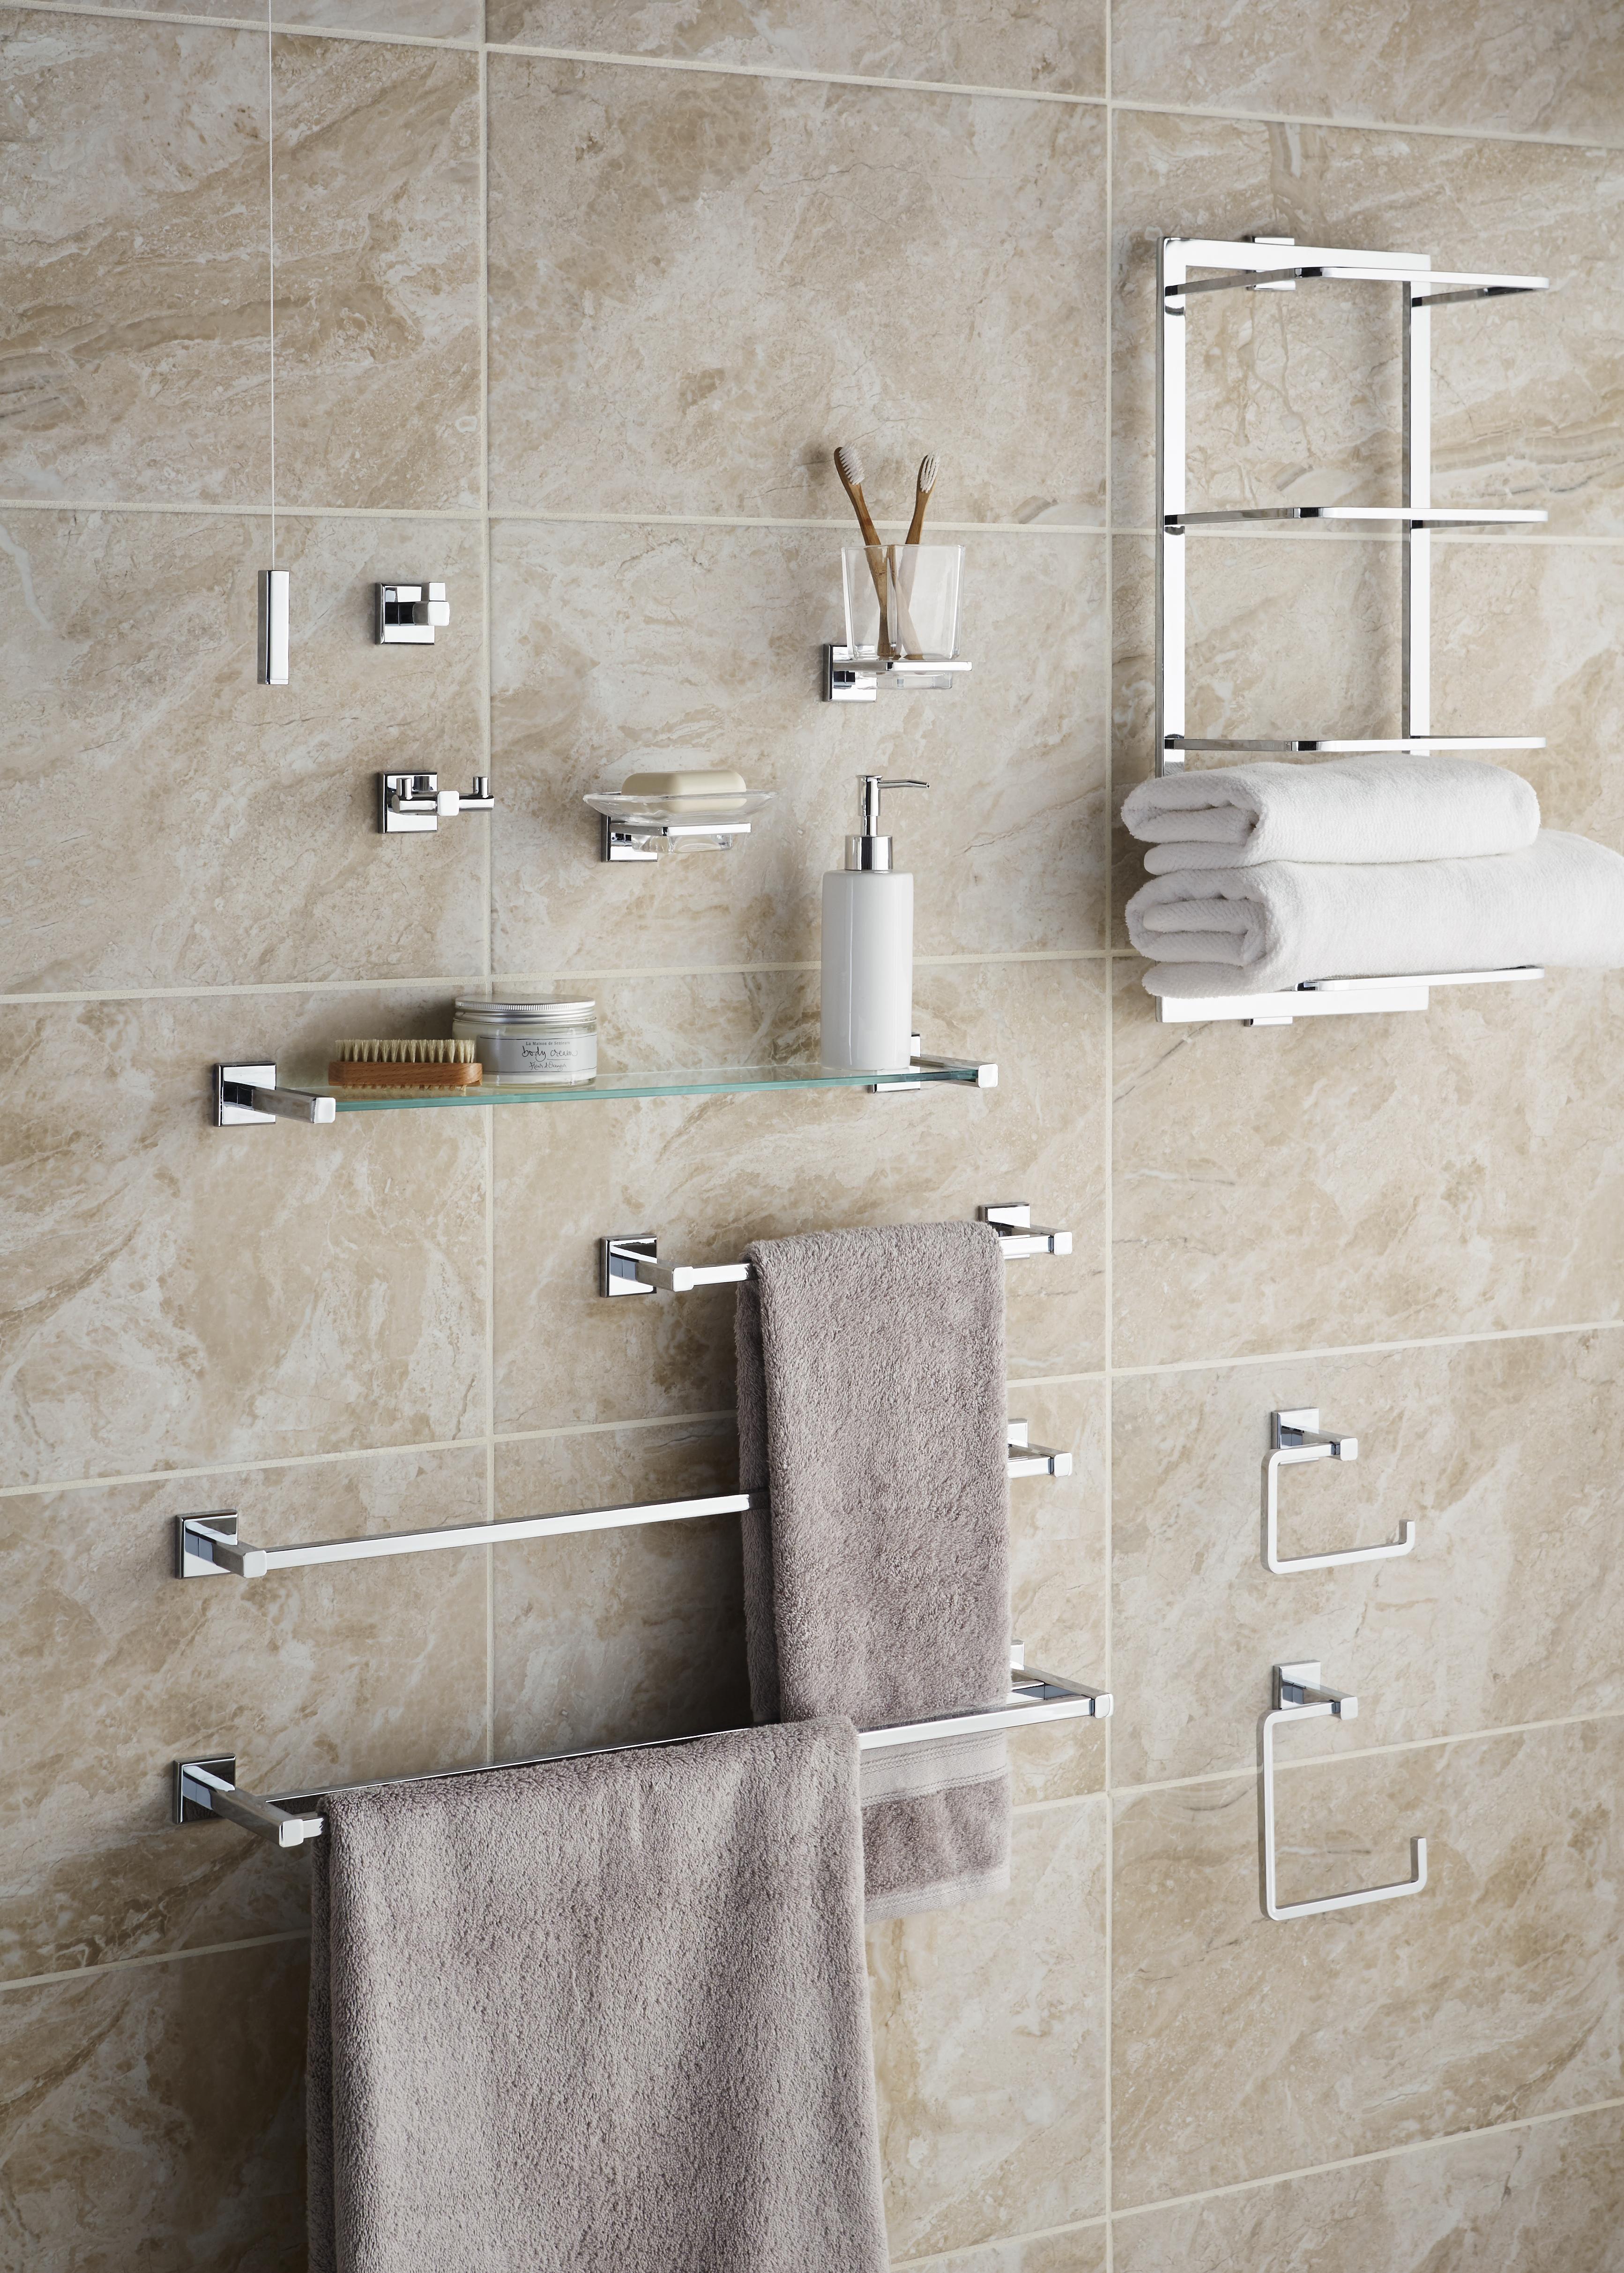 Towel Rails U0026amp; Rings